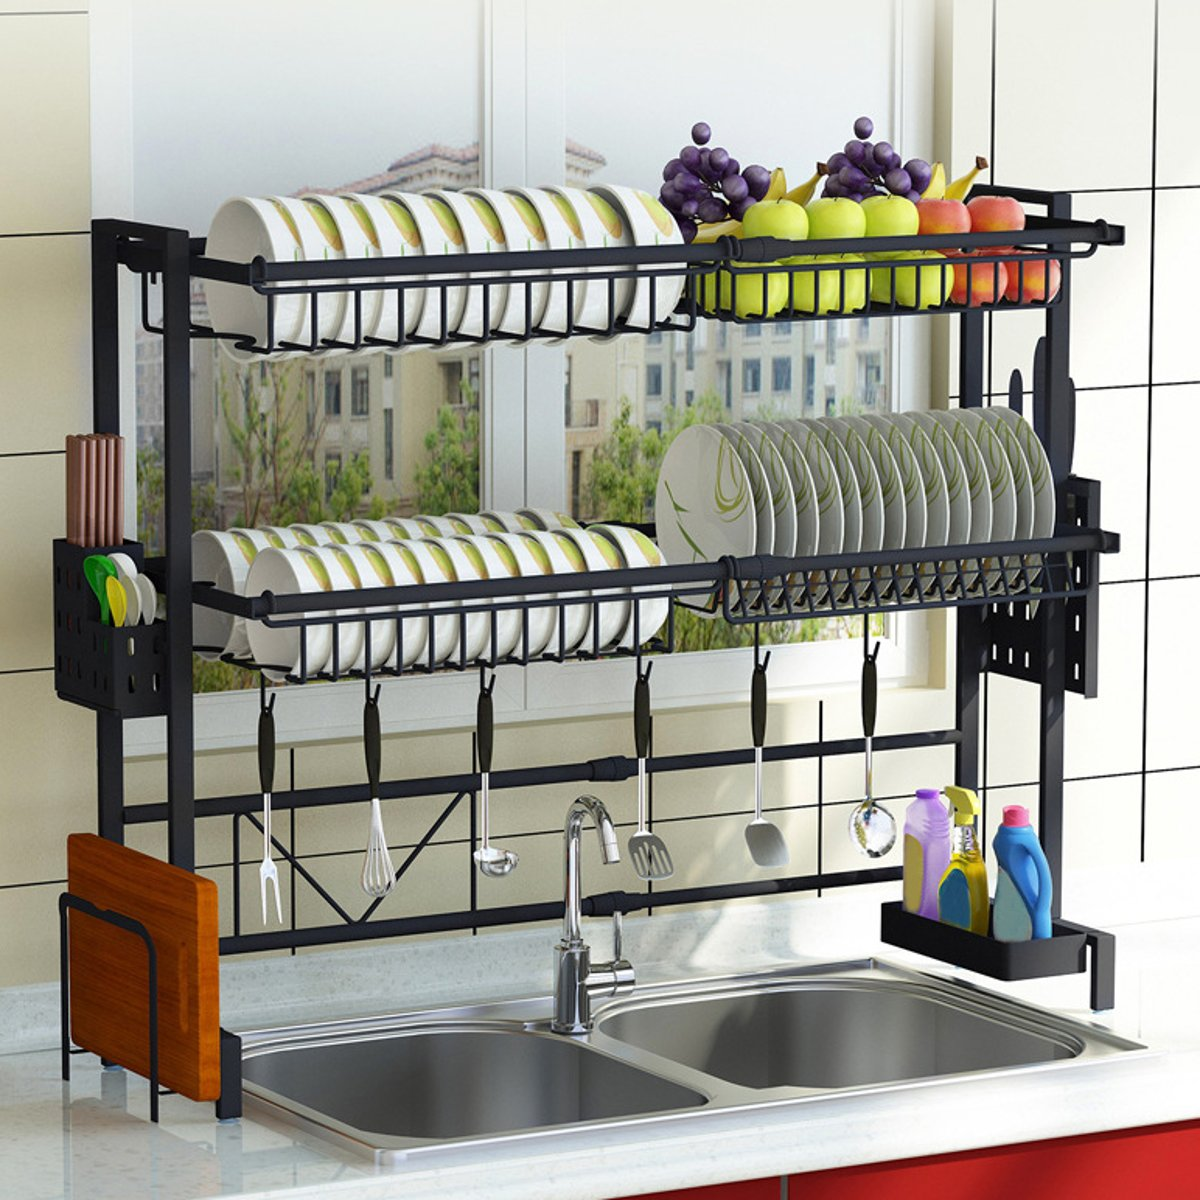 upgraded 1 2tier sink rack dish drainer for kitchen sink racks stainless steel over the sink shelf storage rack walmart com